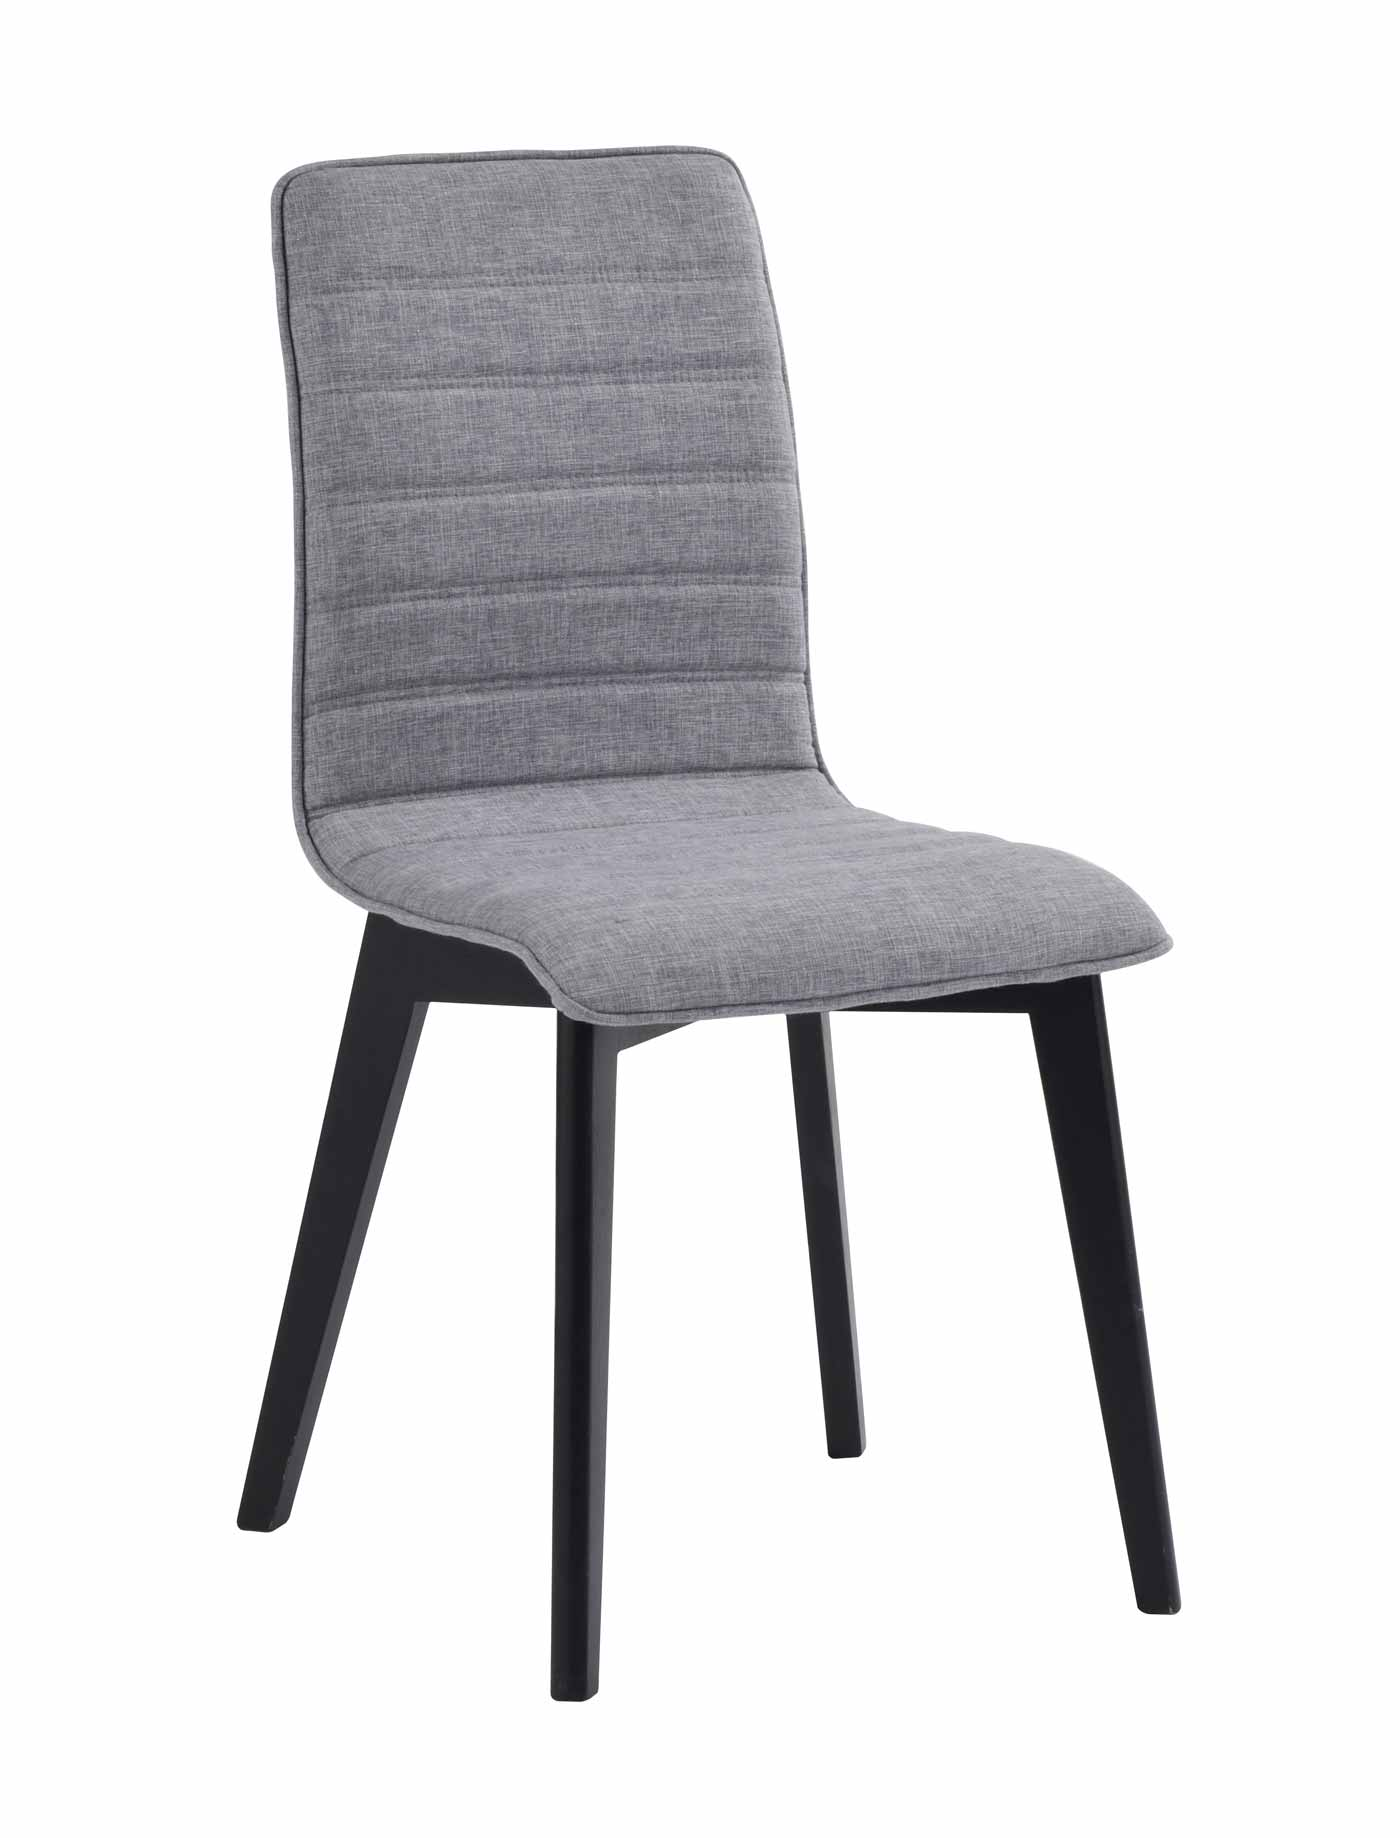 ROWICO Grace spisebordsstol - lysegråt stof/sortlakeret eg